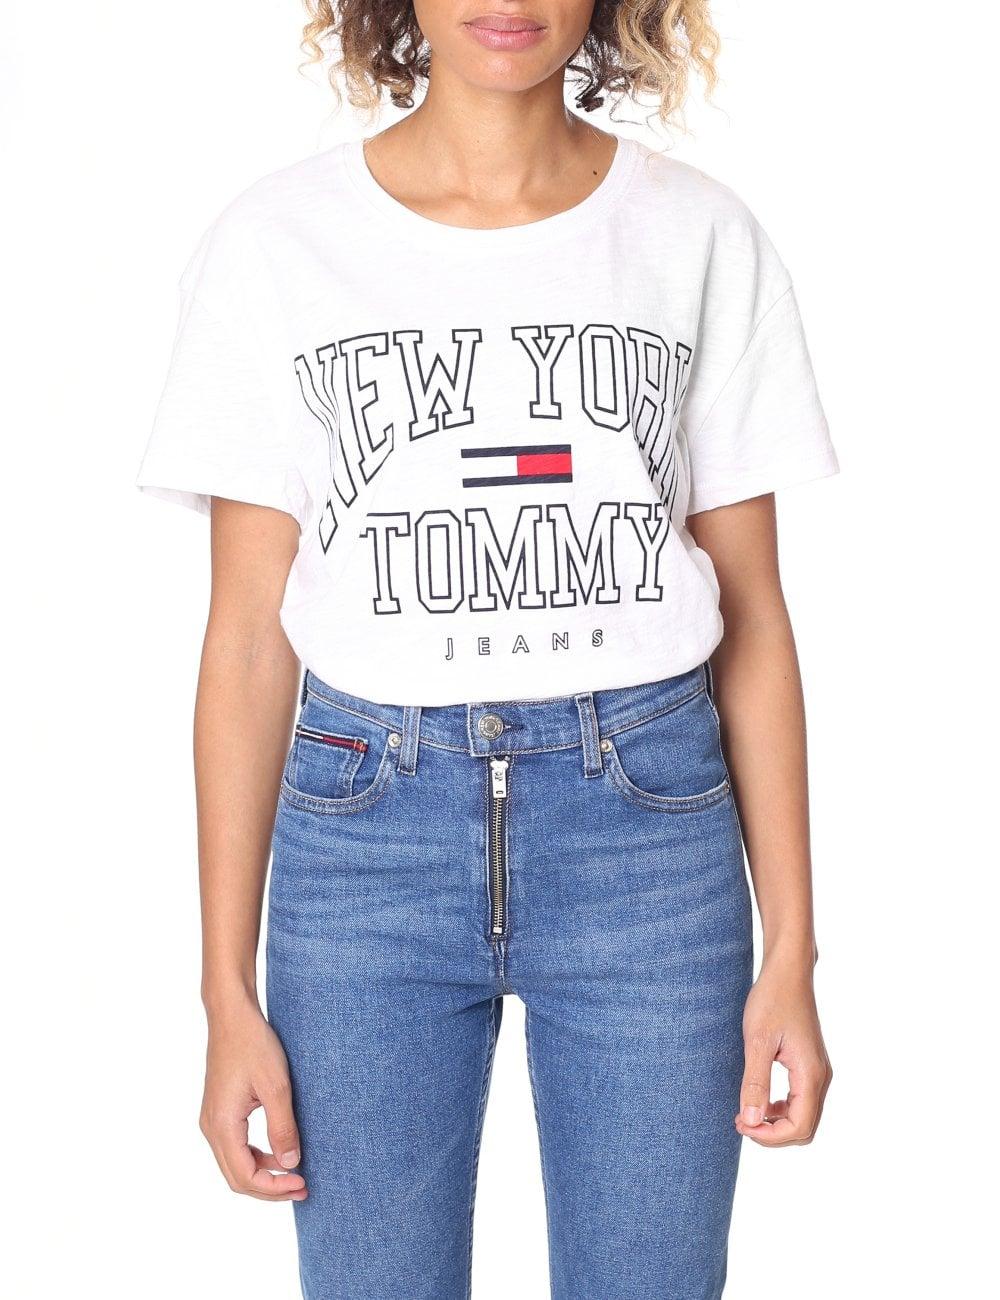 23ed3133d Tommy Hilfiger Women's Boxy New York Tee